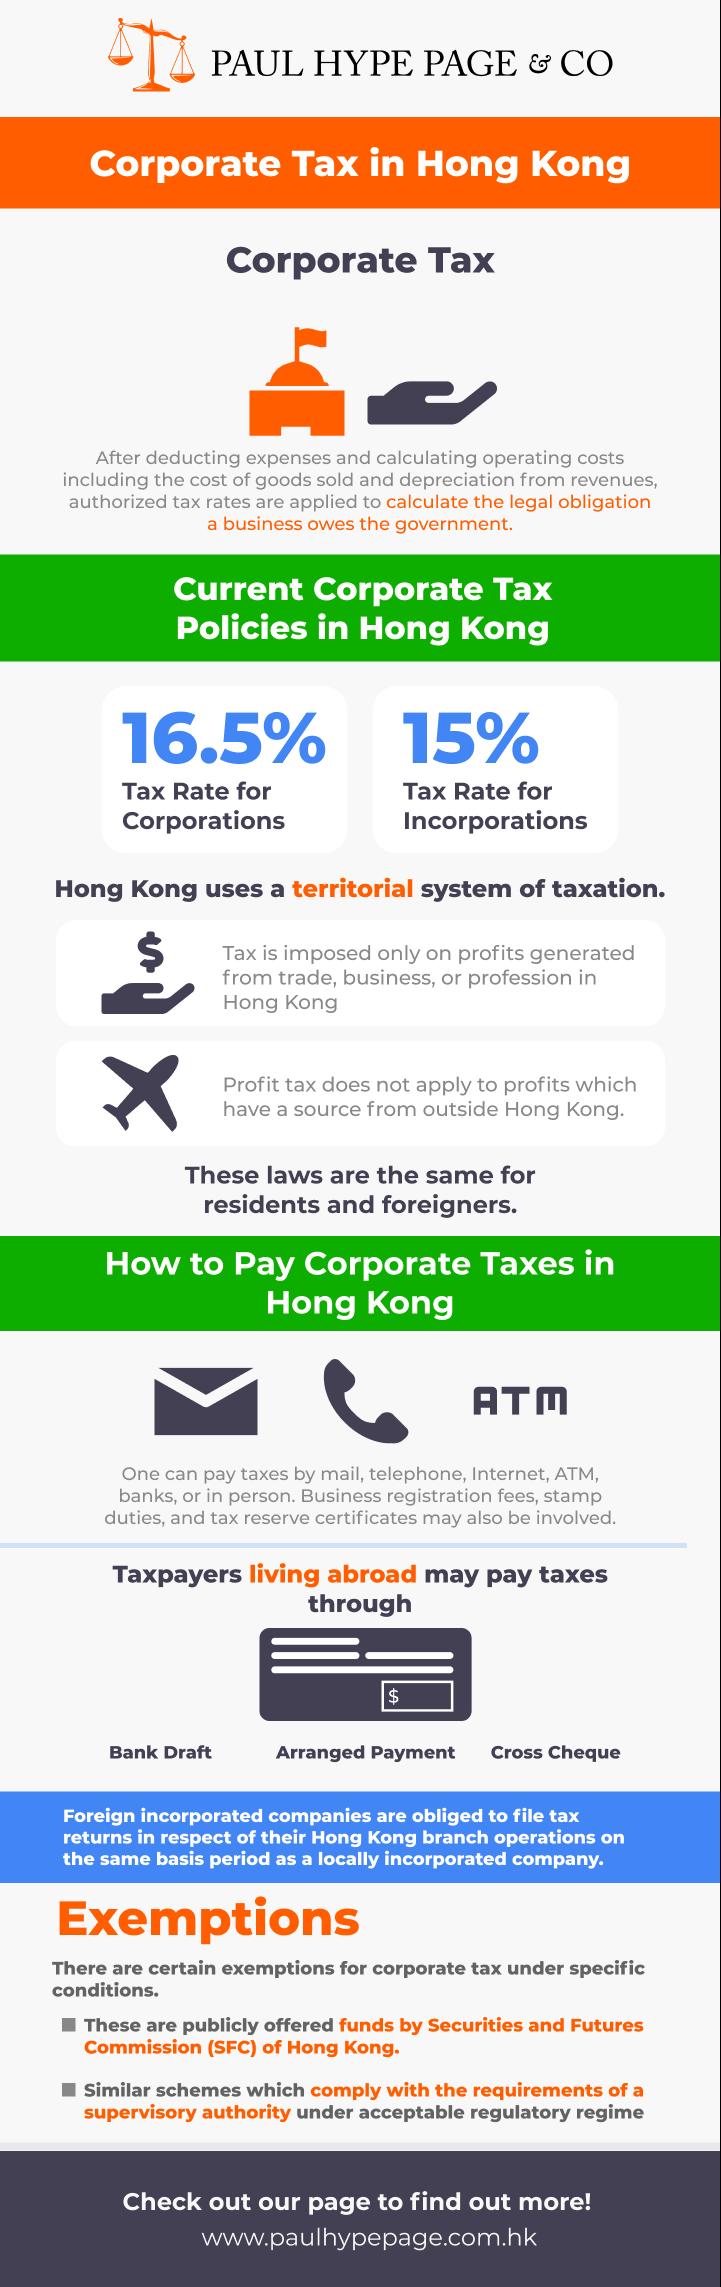 Corporate Tax in Hong Kong